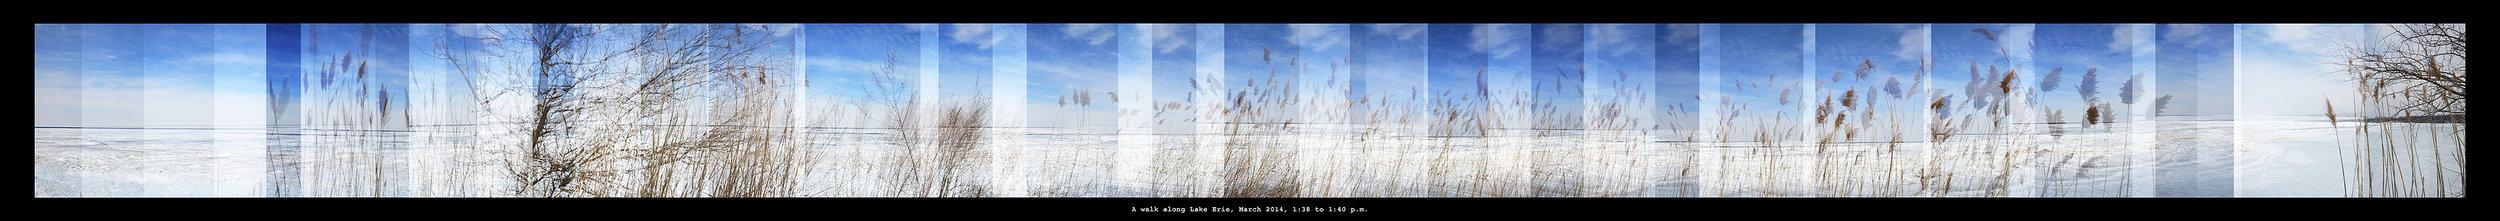 Walk Past Reeds